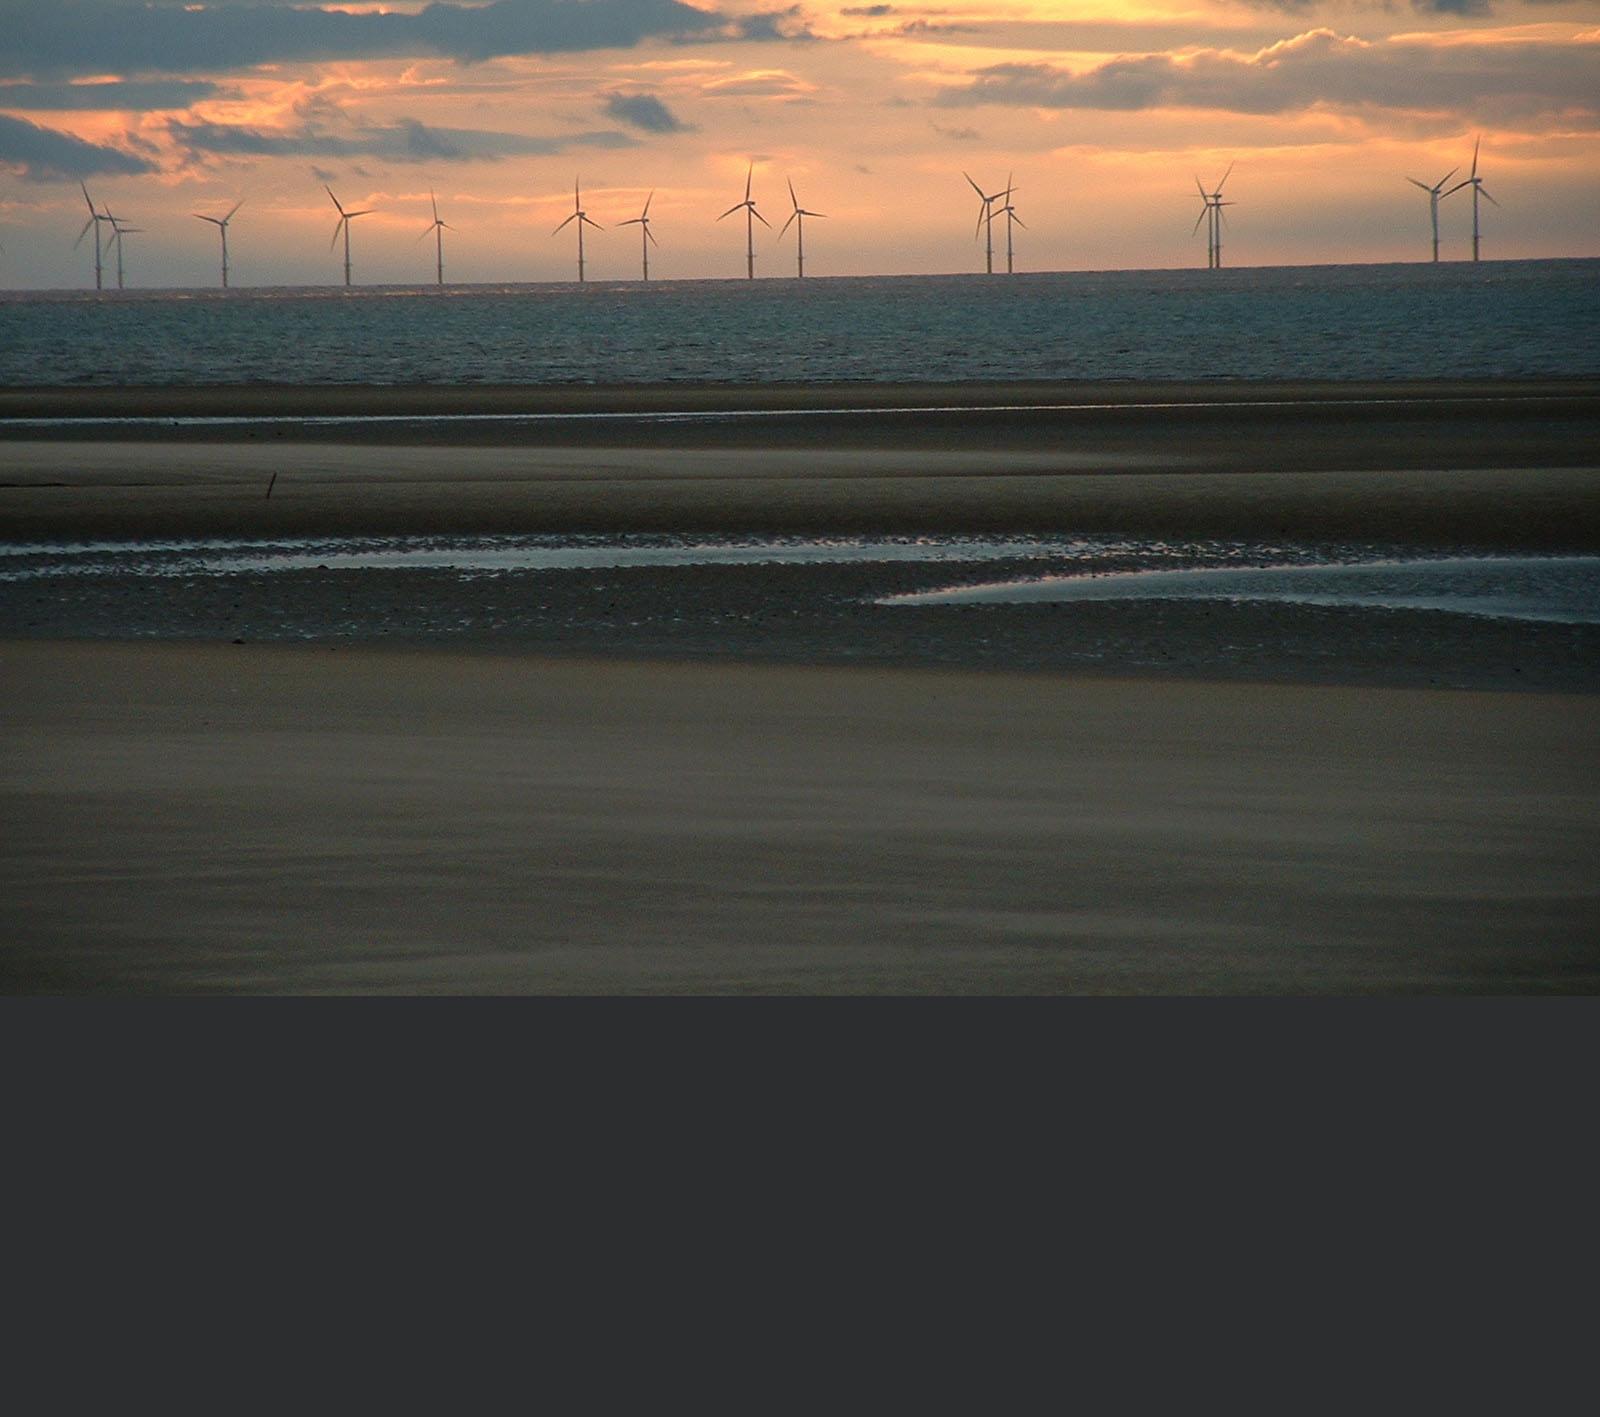 Description Flow Diagram For Wind Turbine Plantjpg